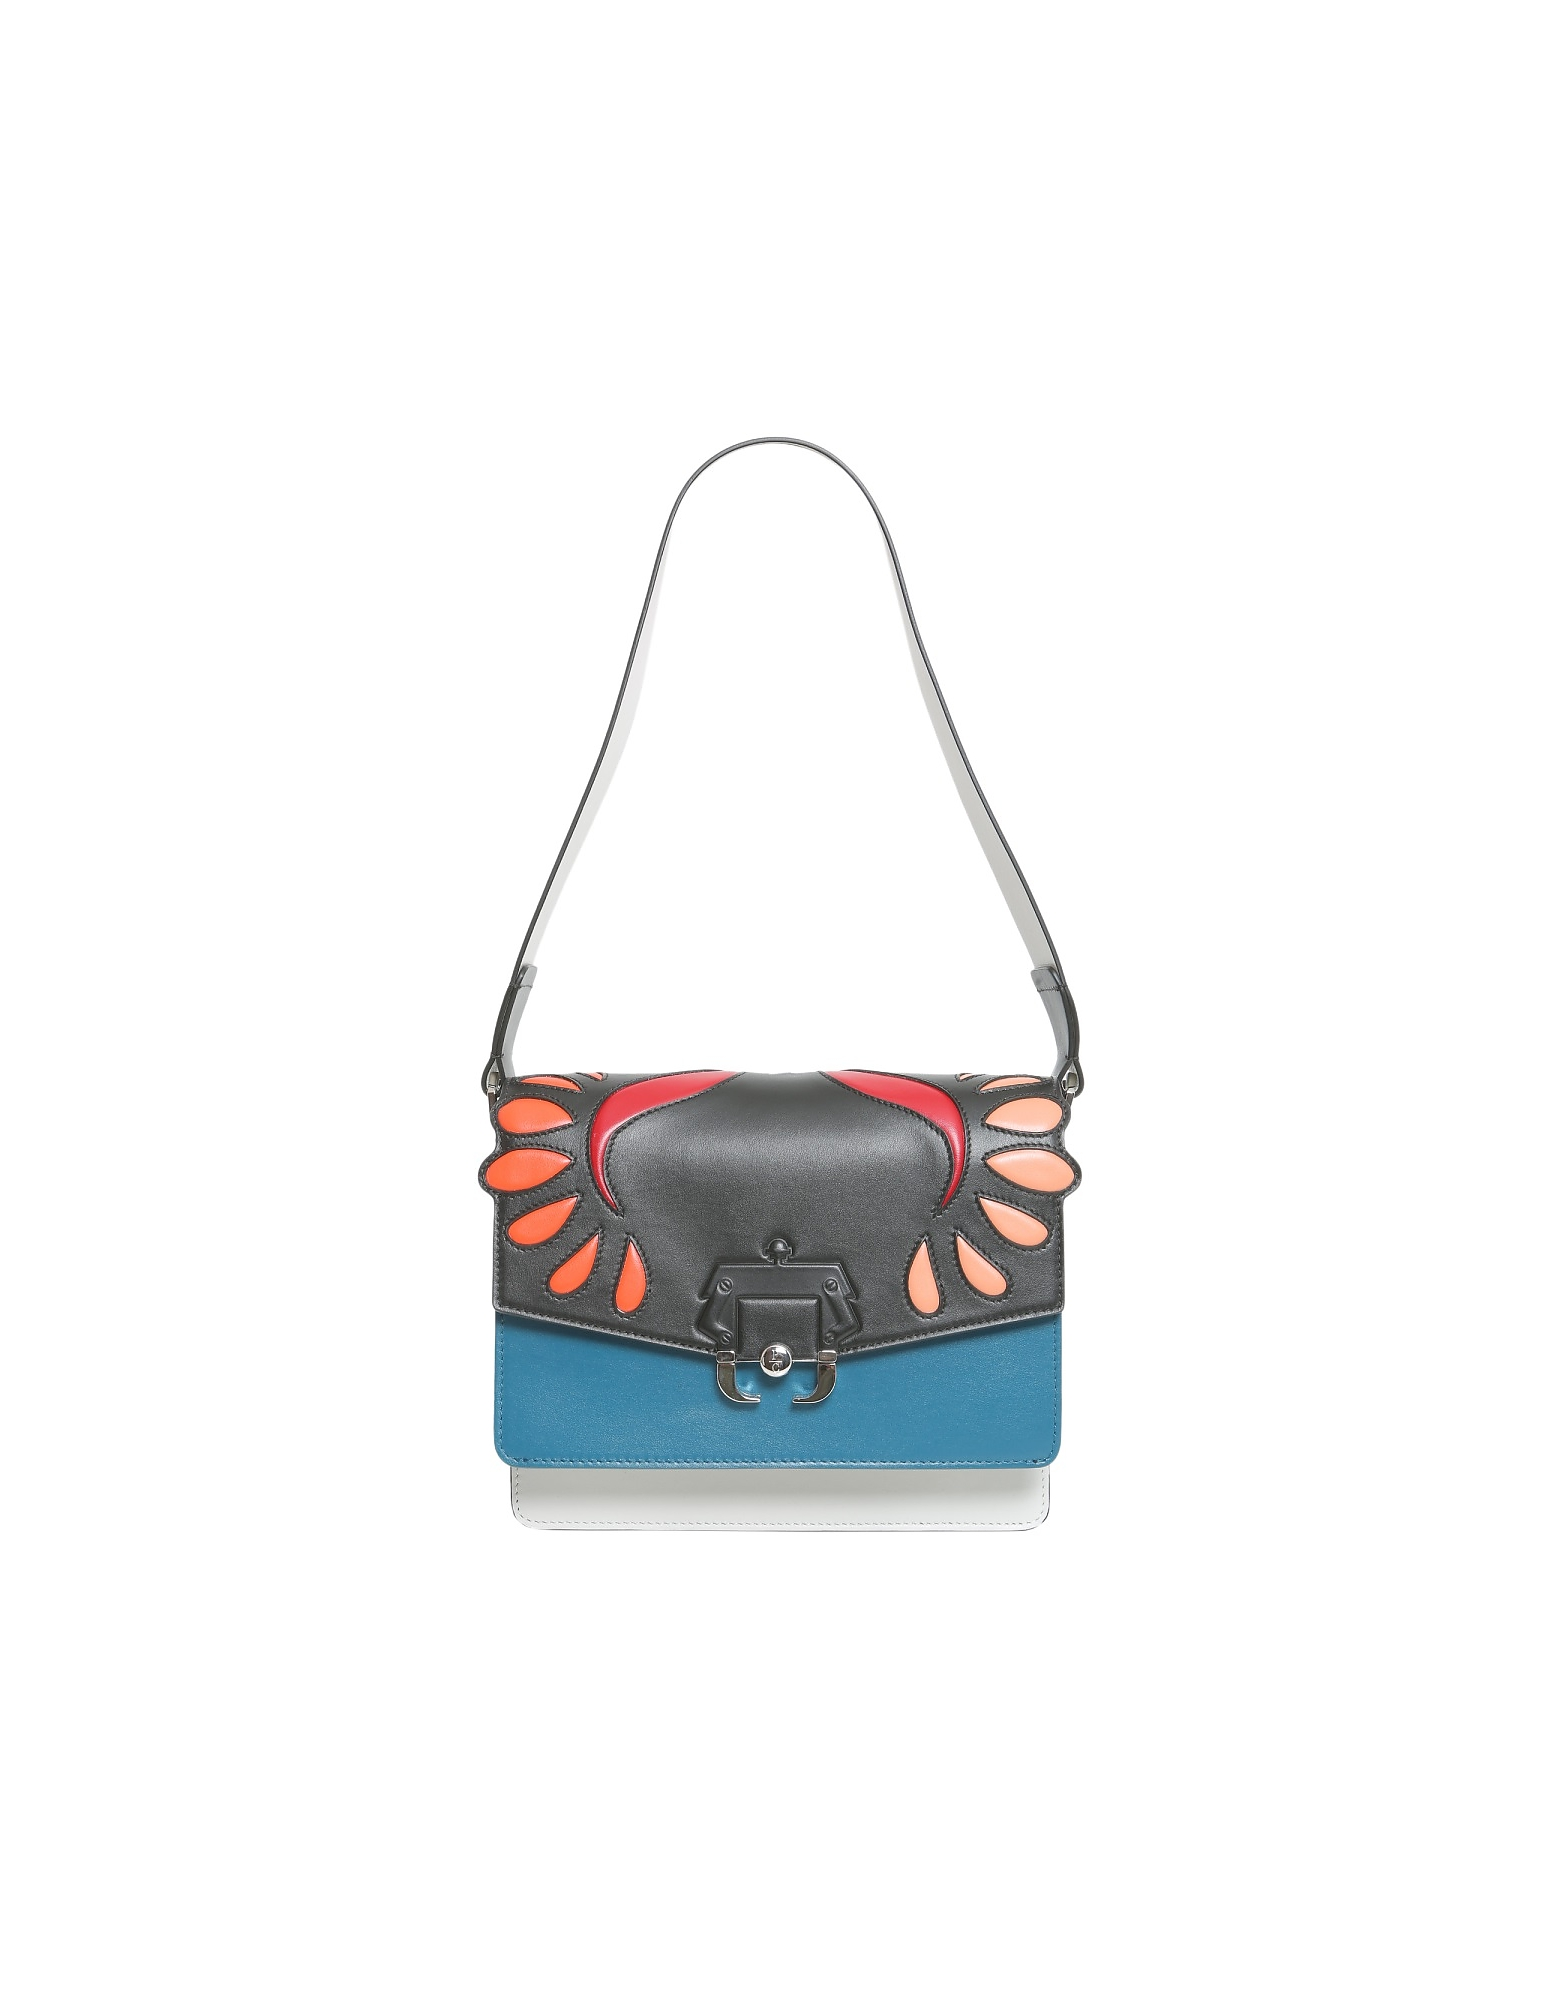 Paula Cademartori Designer Handbags, Twiggy Shoulder Bag